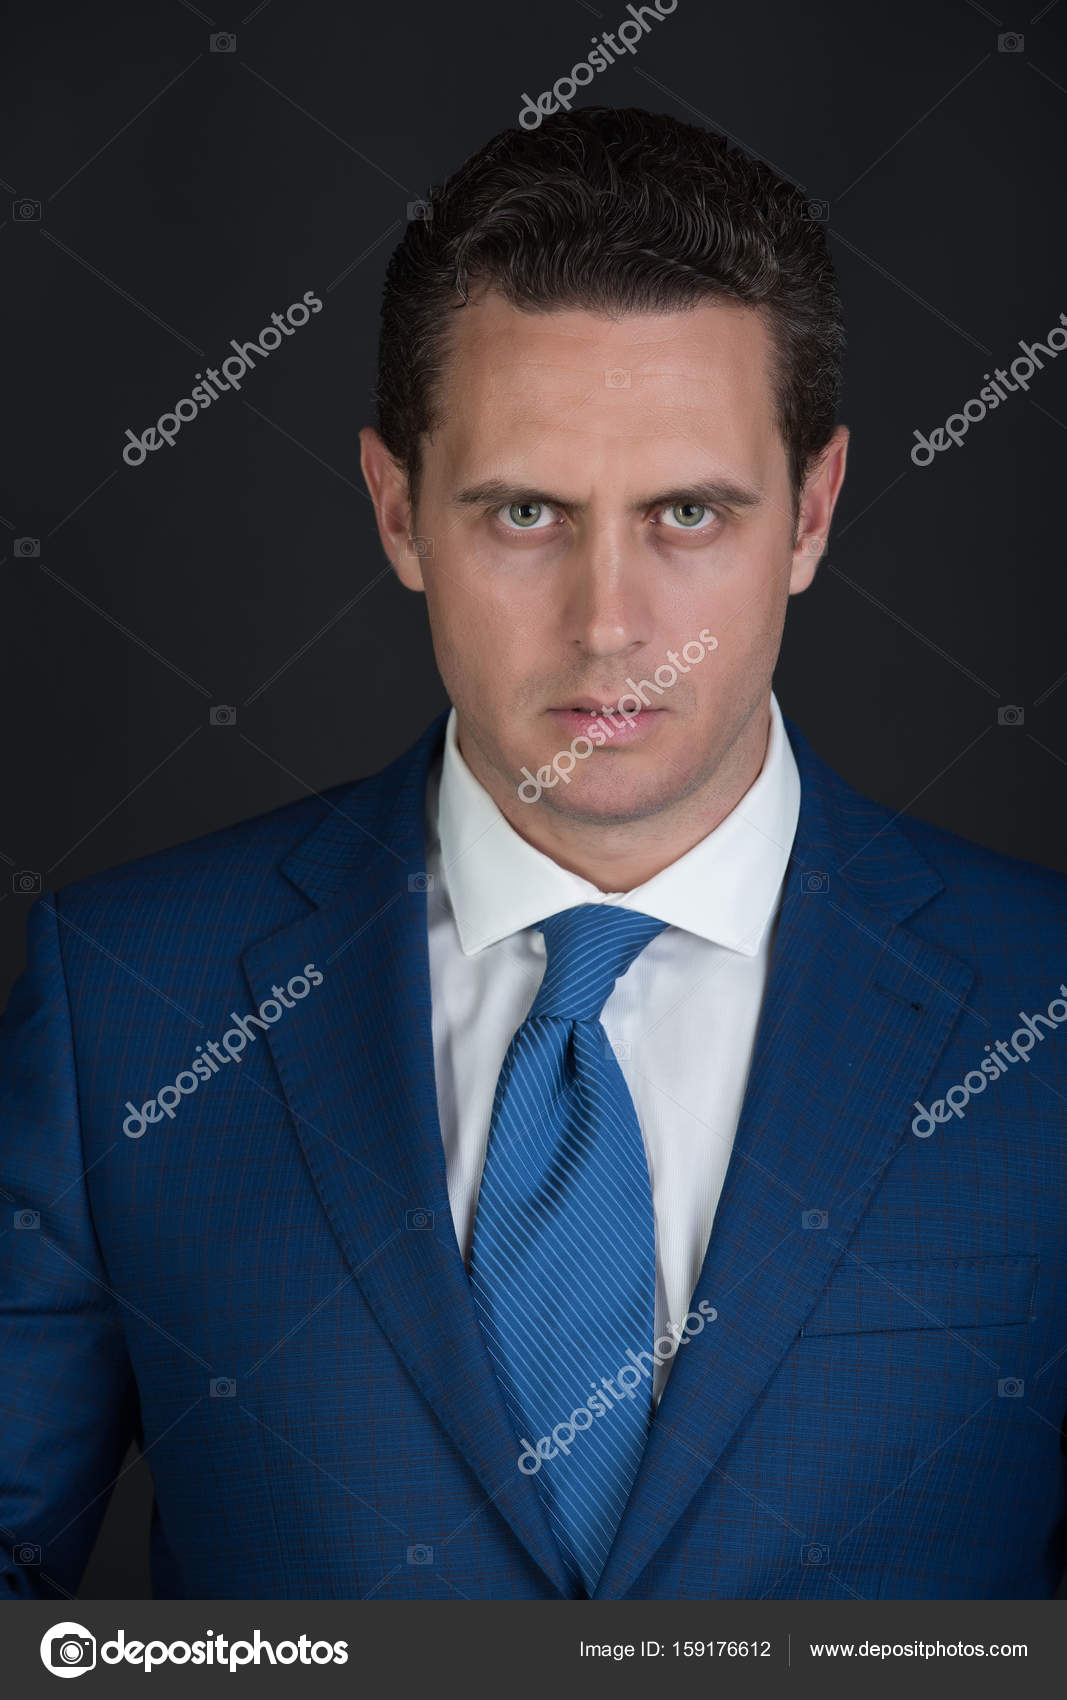 Businessman Posing In Elegant Blue Jacket And Tie Stock Photo